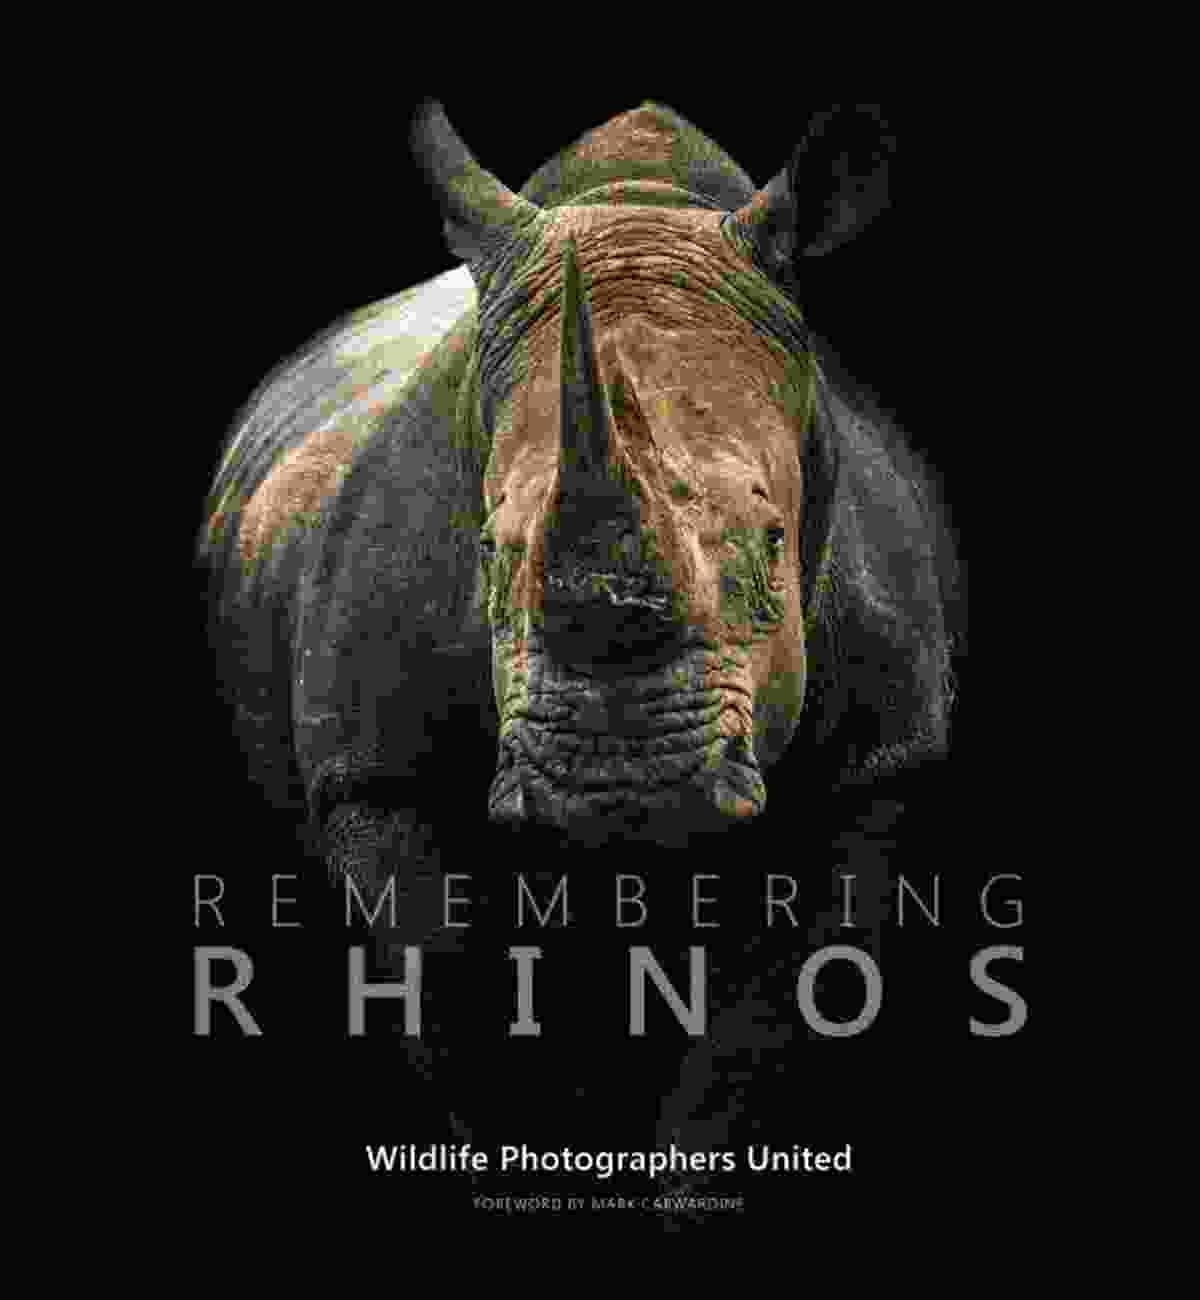 Southern white rhino, South Africa (Denise Eriksson)